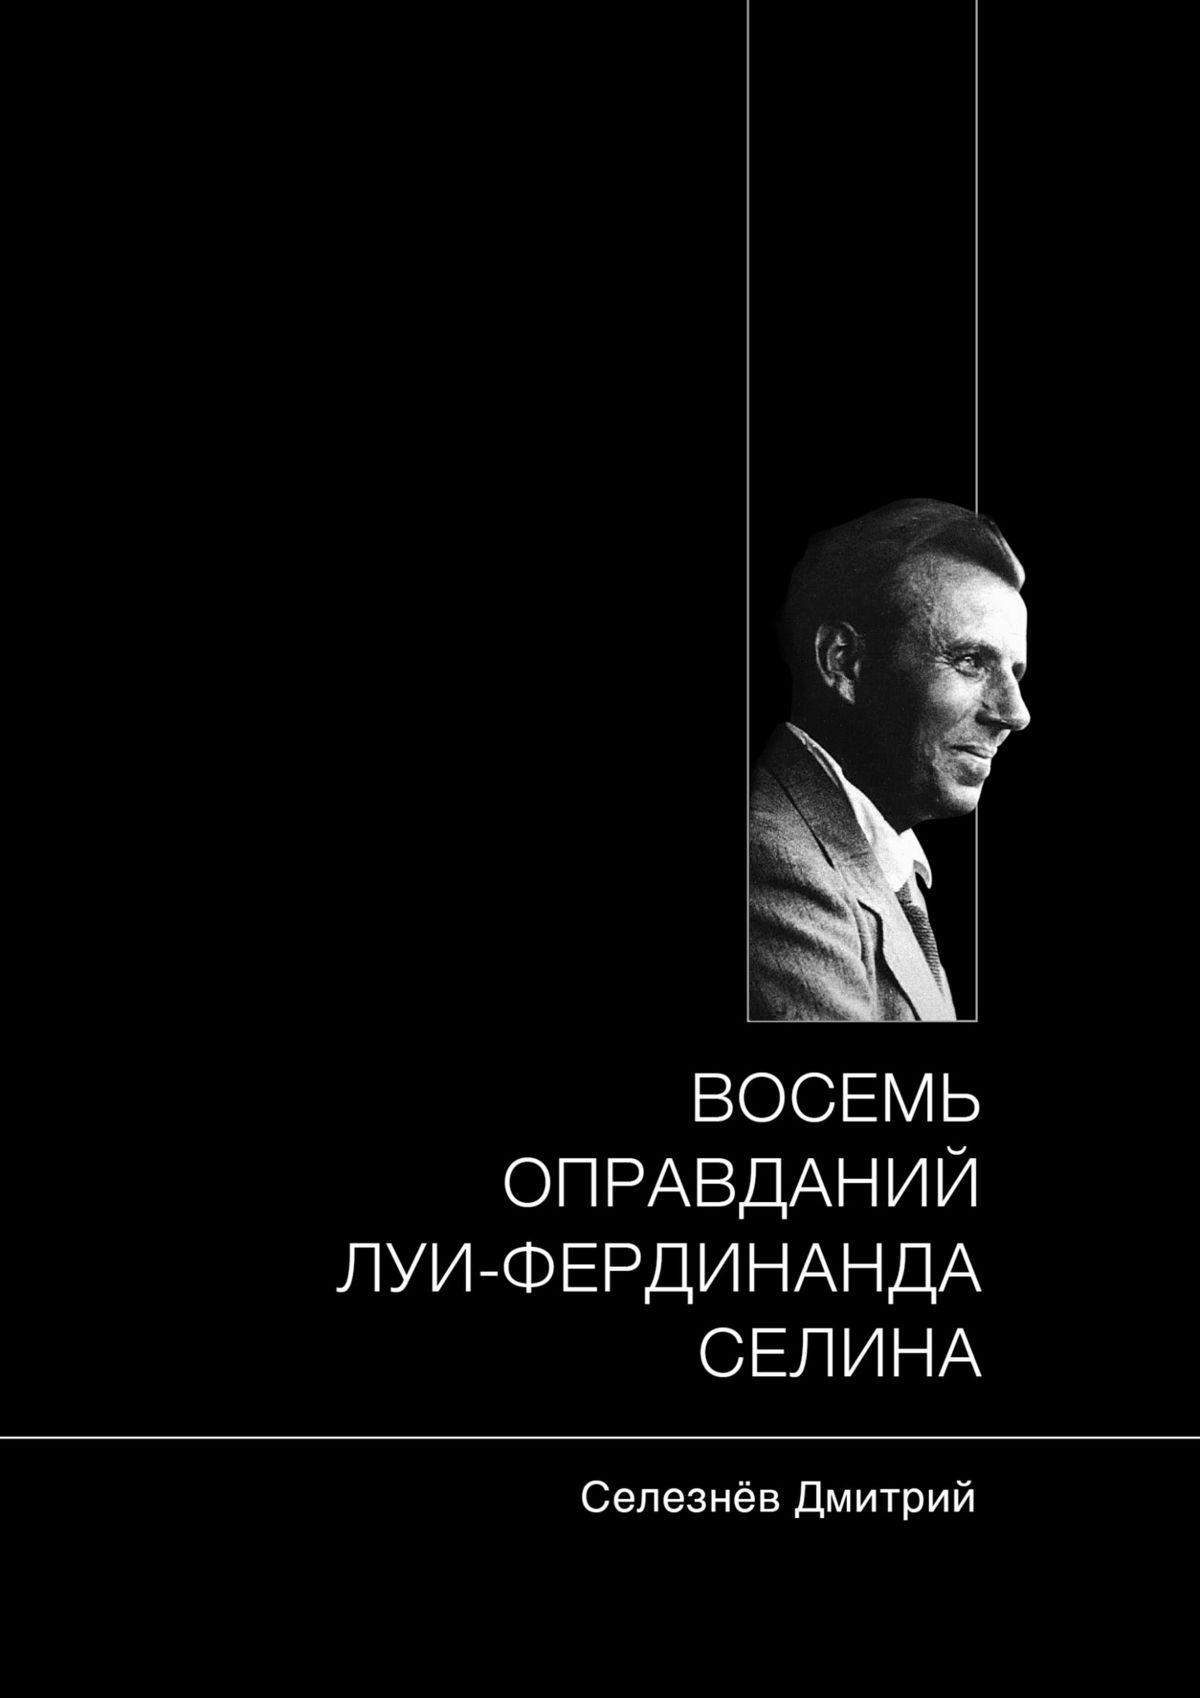 Дмитрий Александрович Селезнёв Восемь оправданий Луи-Фердинанда Селина андре мальро андре мальро антимемуары